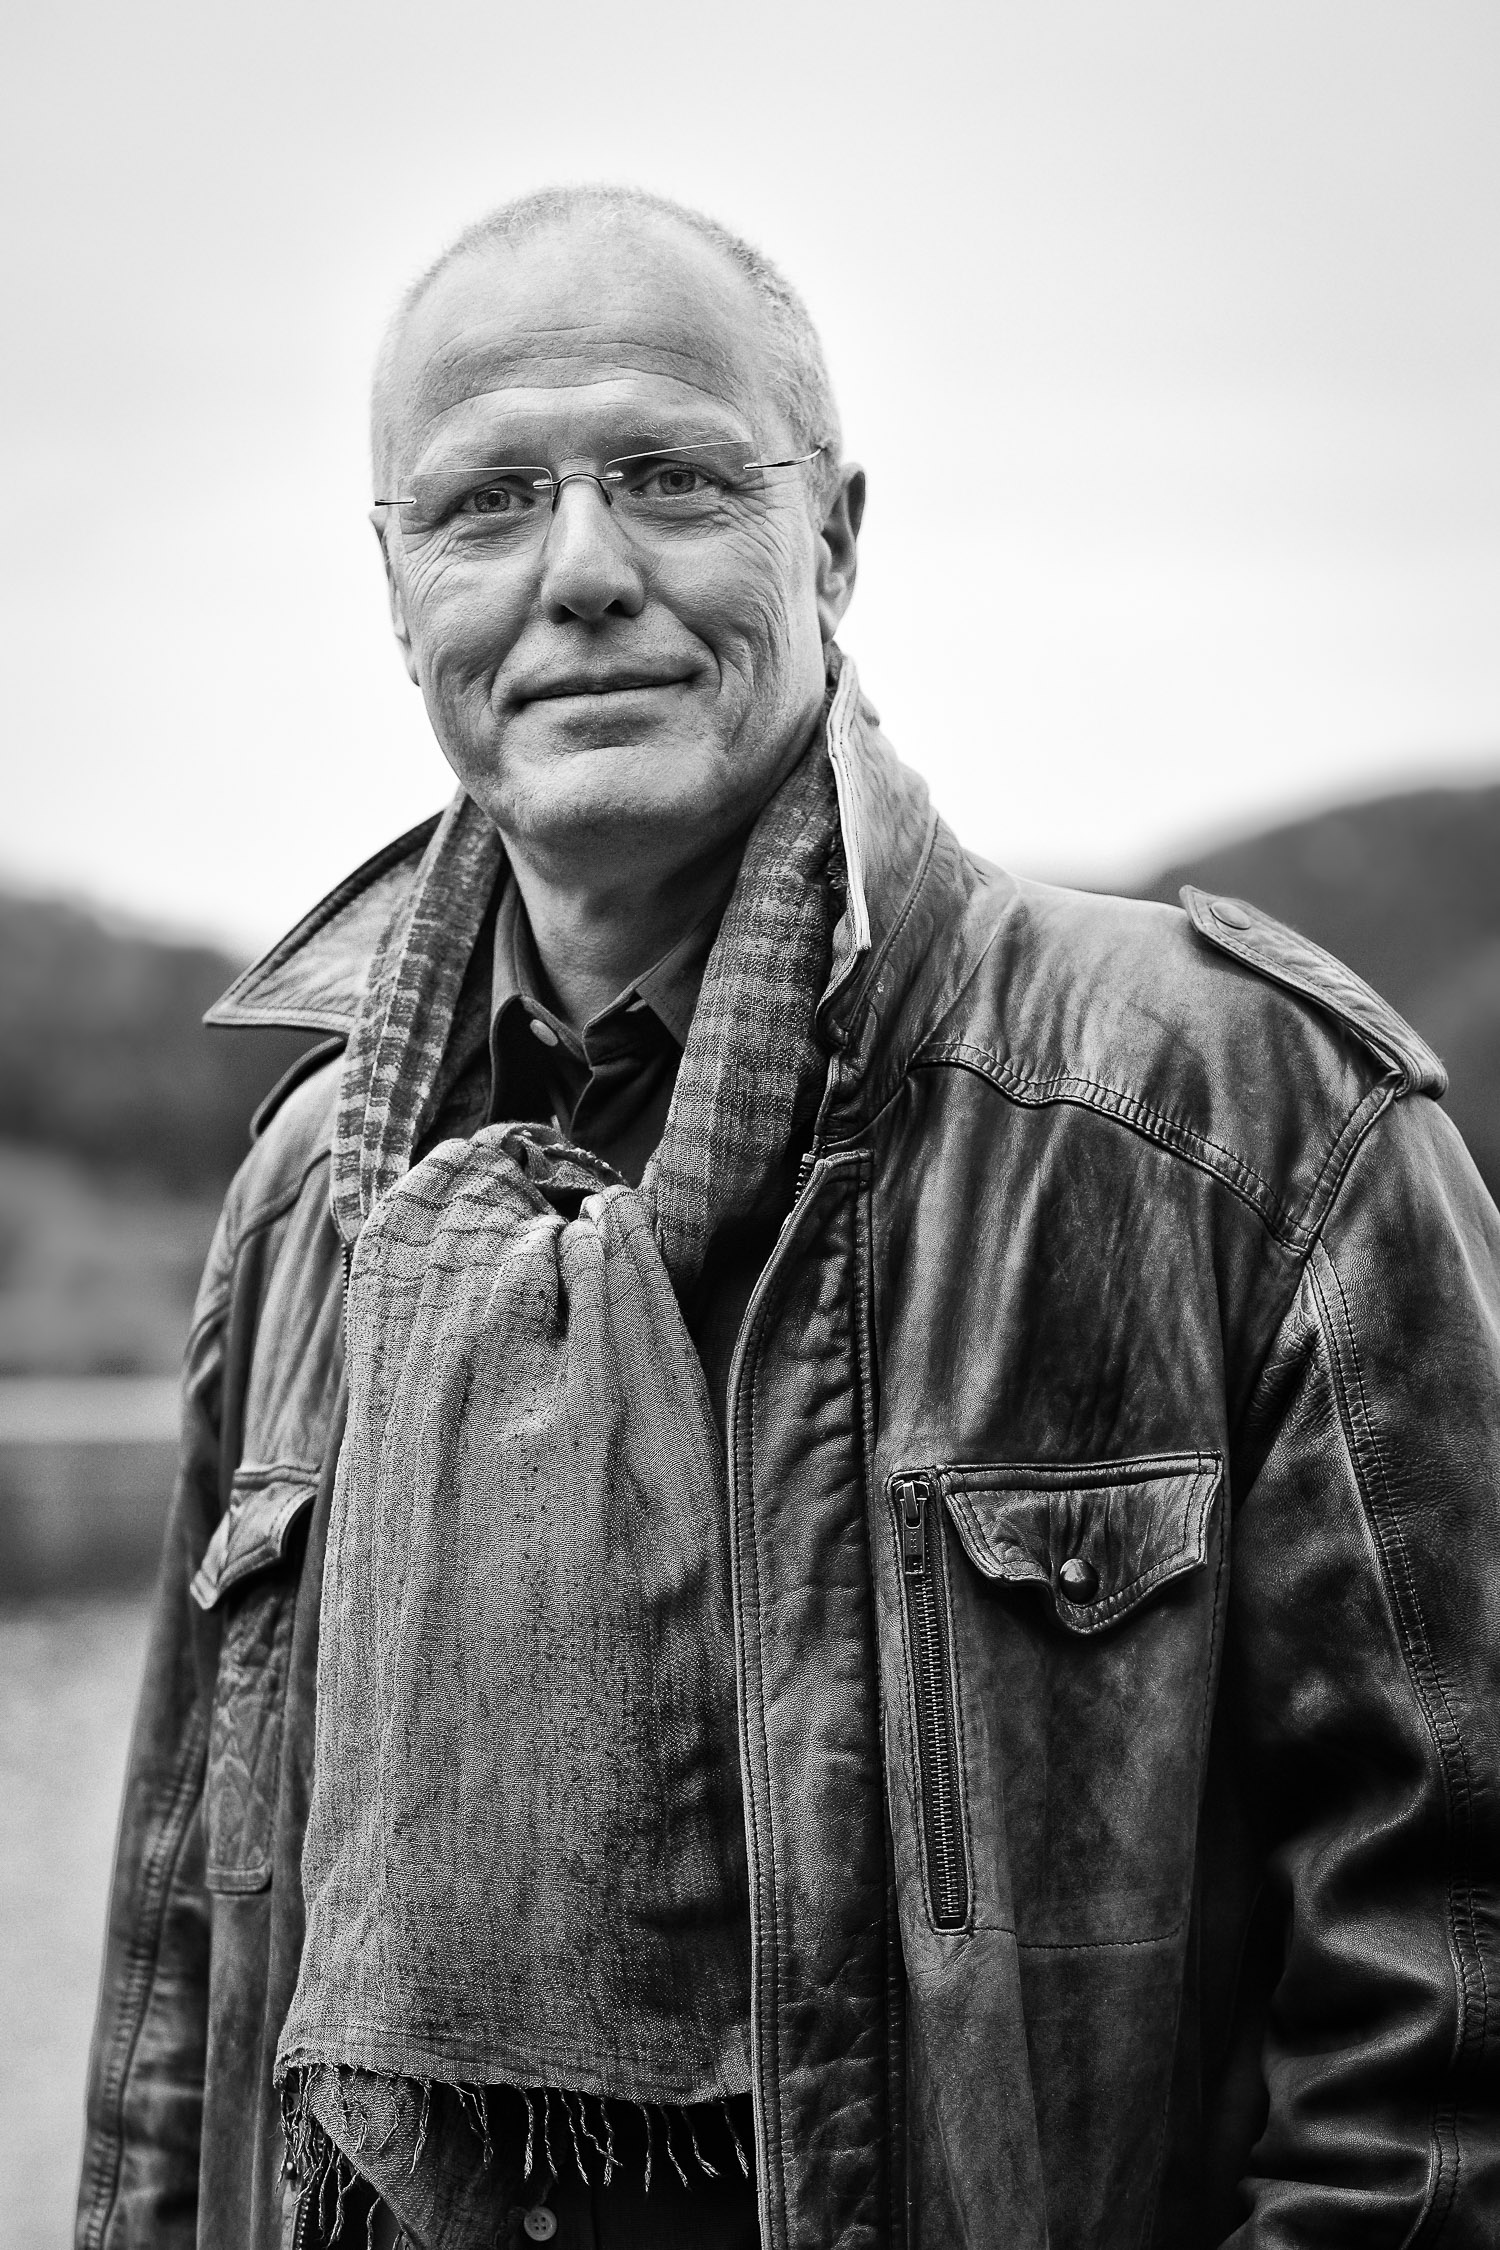 Men portrait, black and white , outdoor,business